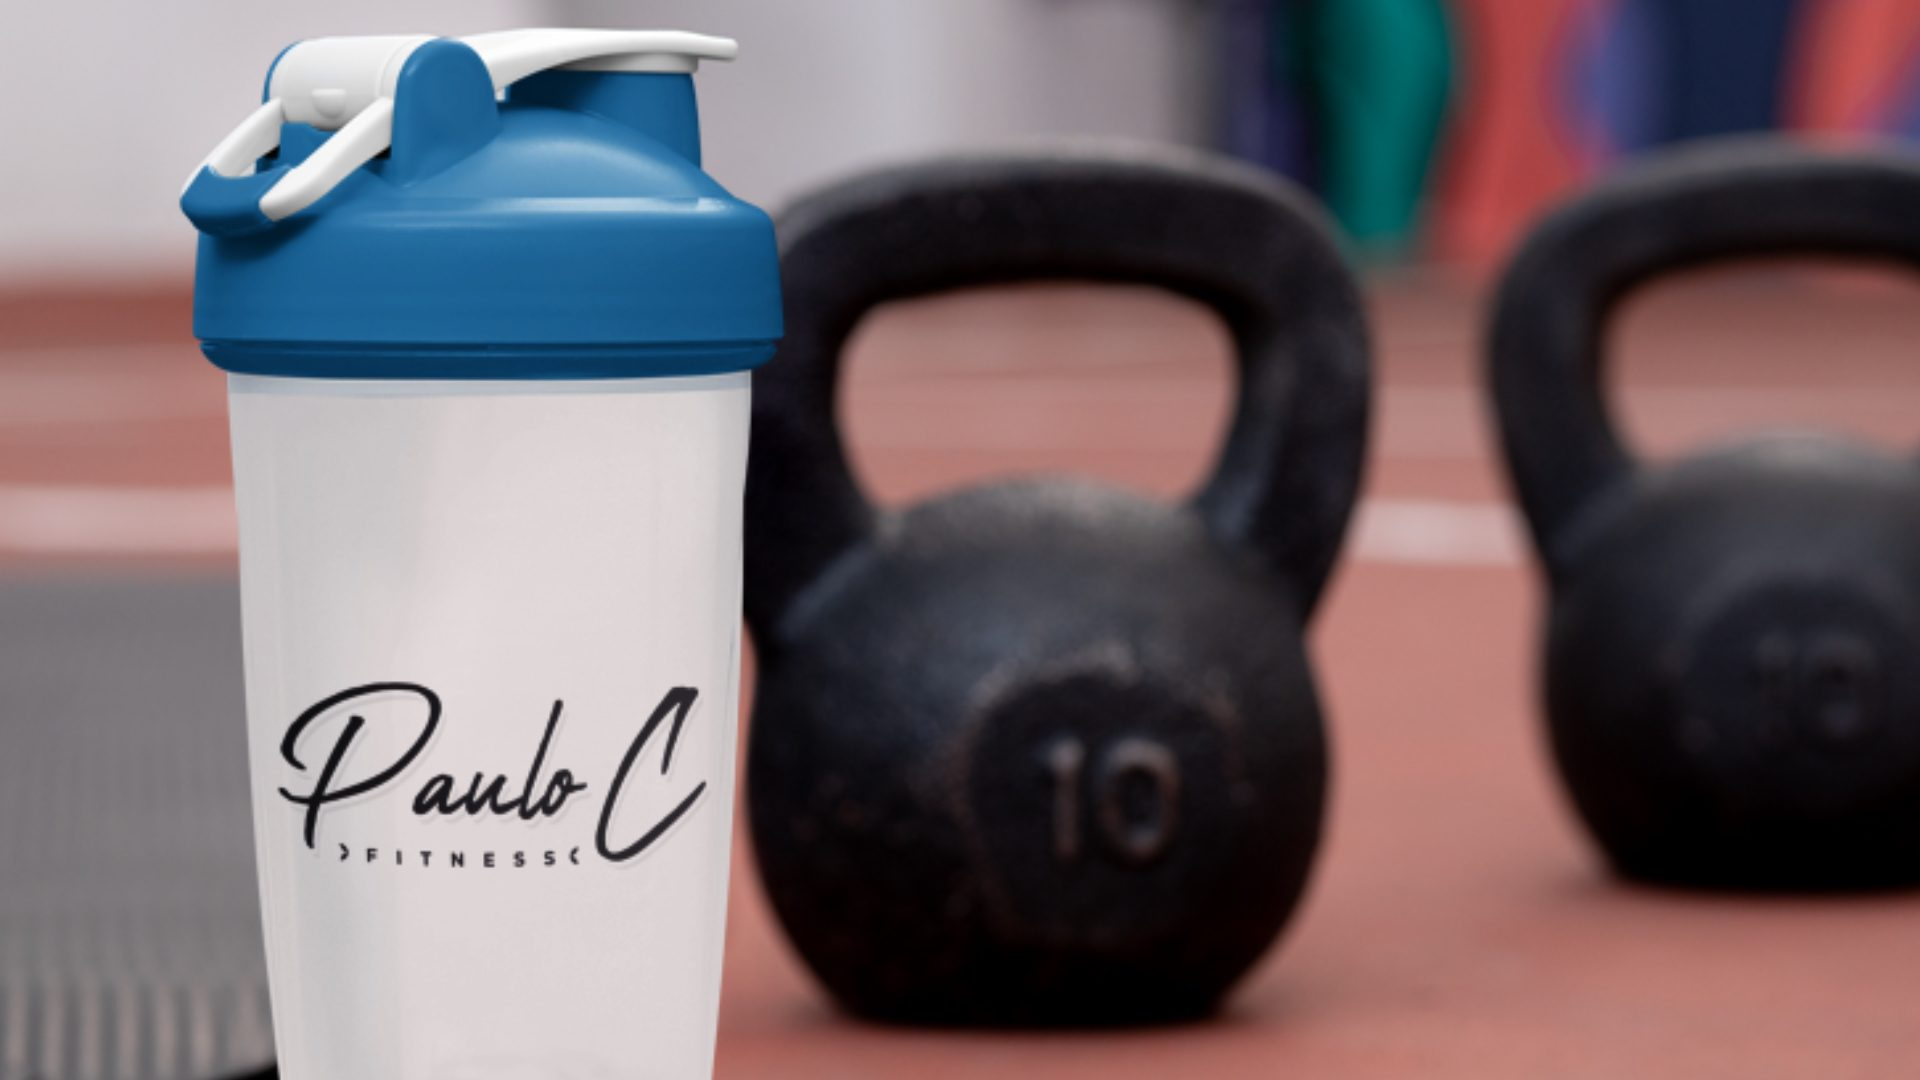 Paulo C Fitness - Logo Mockup 02